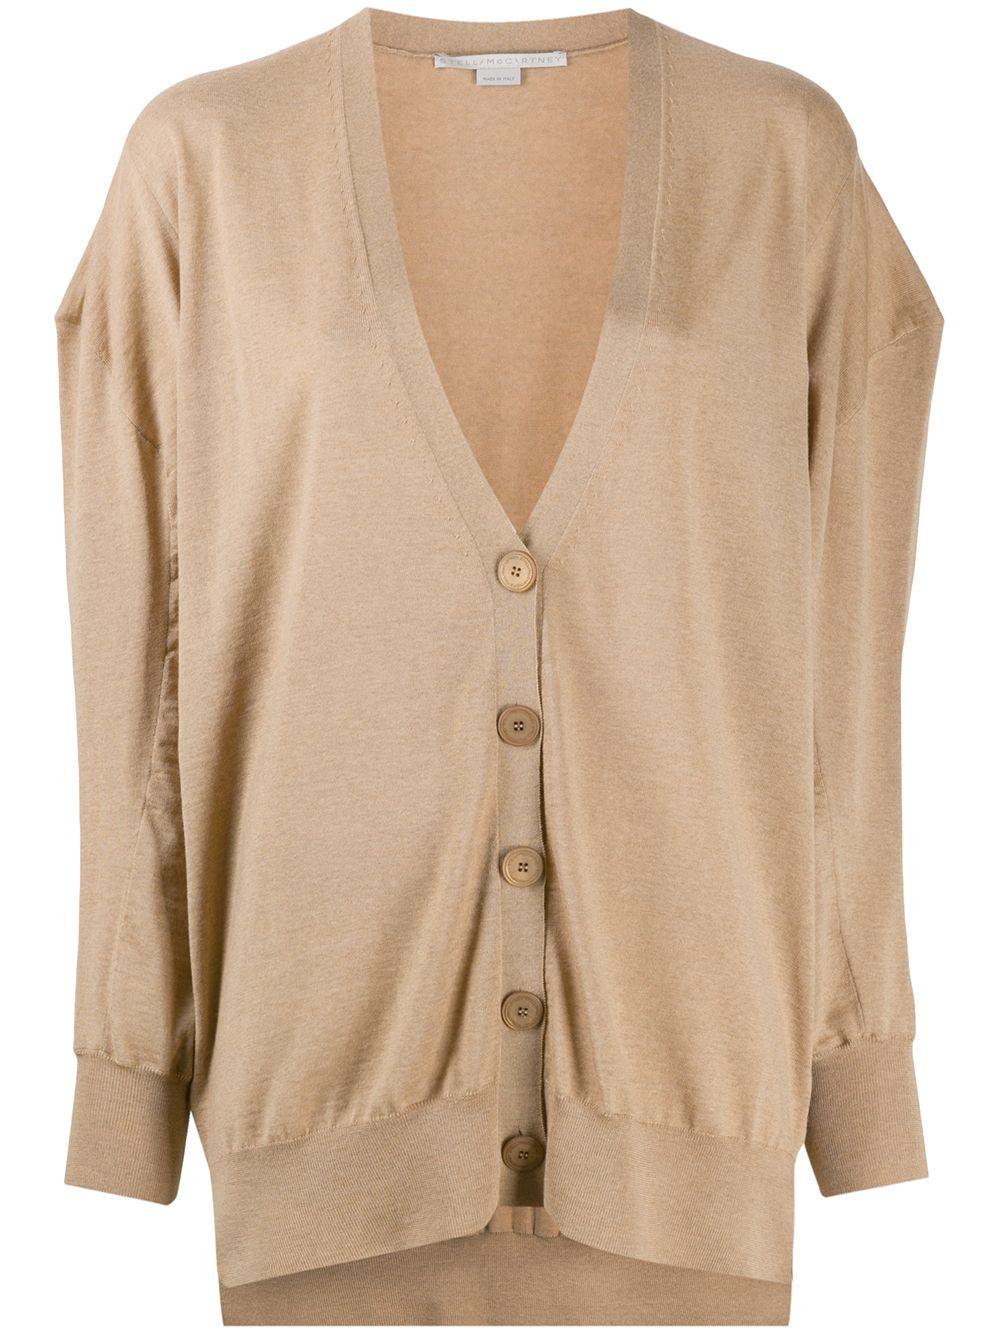 Camel brown virgin wool oversized cardigan featuring V-neck STELLA MC CARTNEY |  | 602030-S17352742